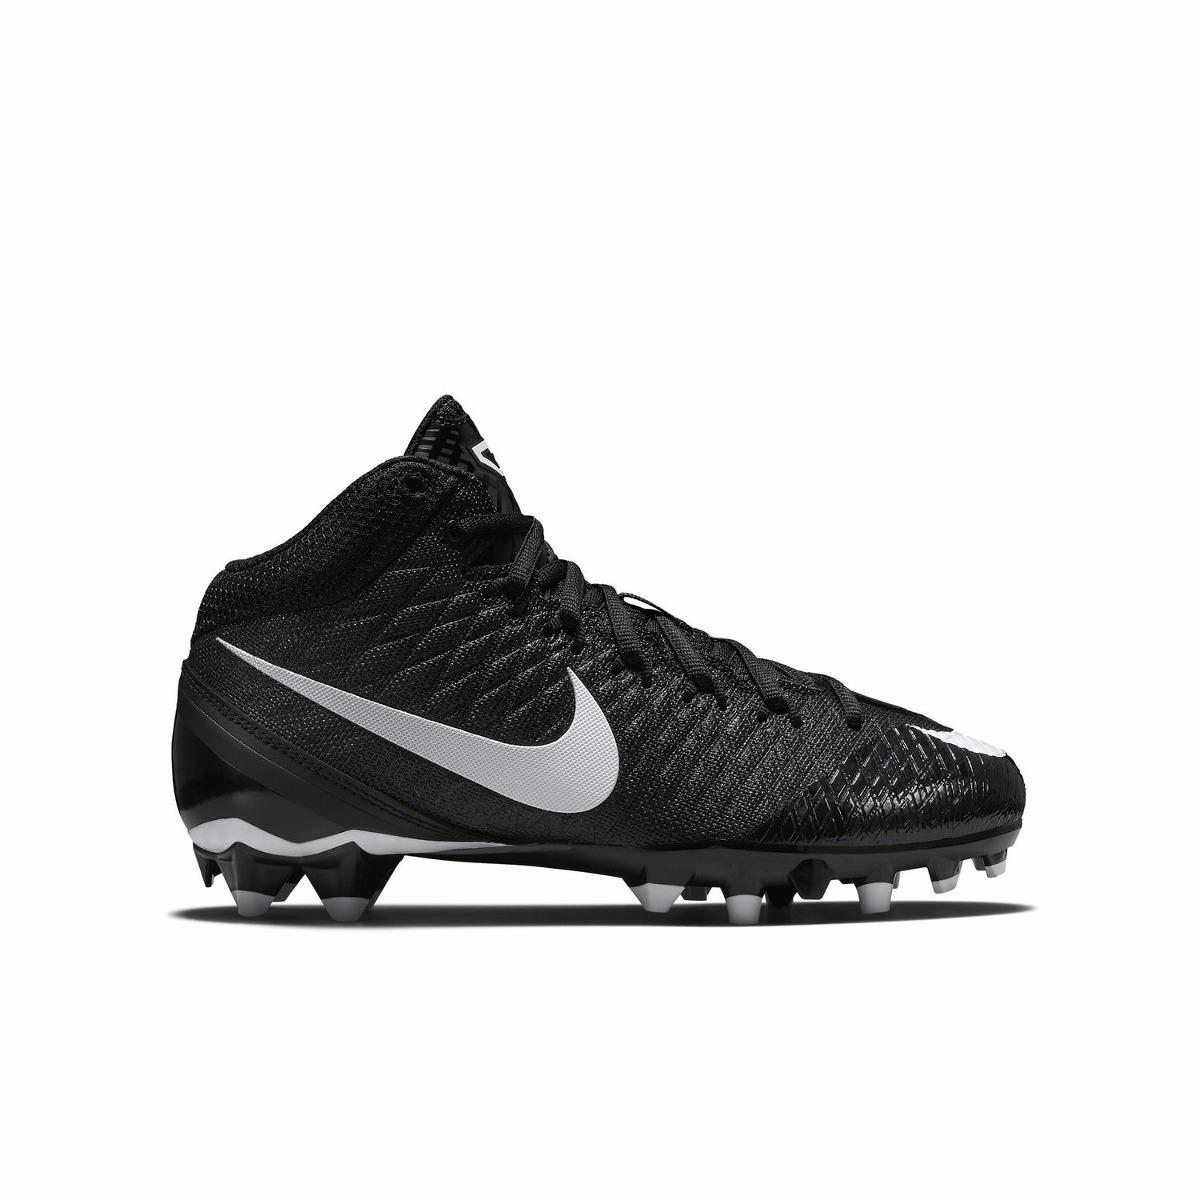 1db0b4d91ec39 Zapatos Tacos P  Futbol Americano Nike Cj 3 Pro Td P  Niño ...